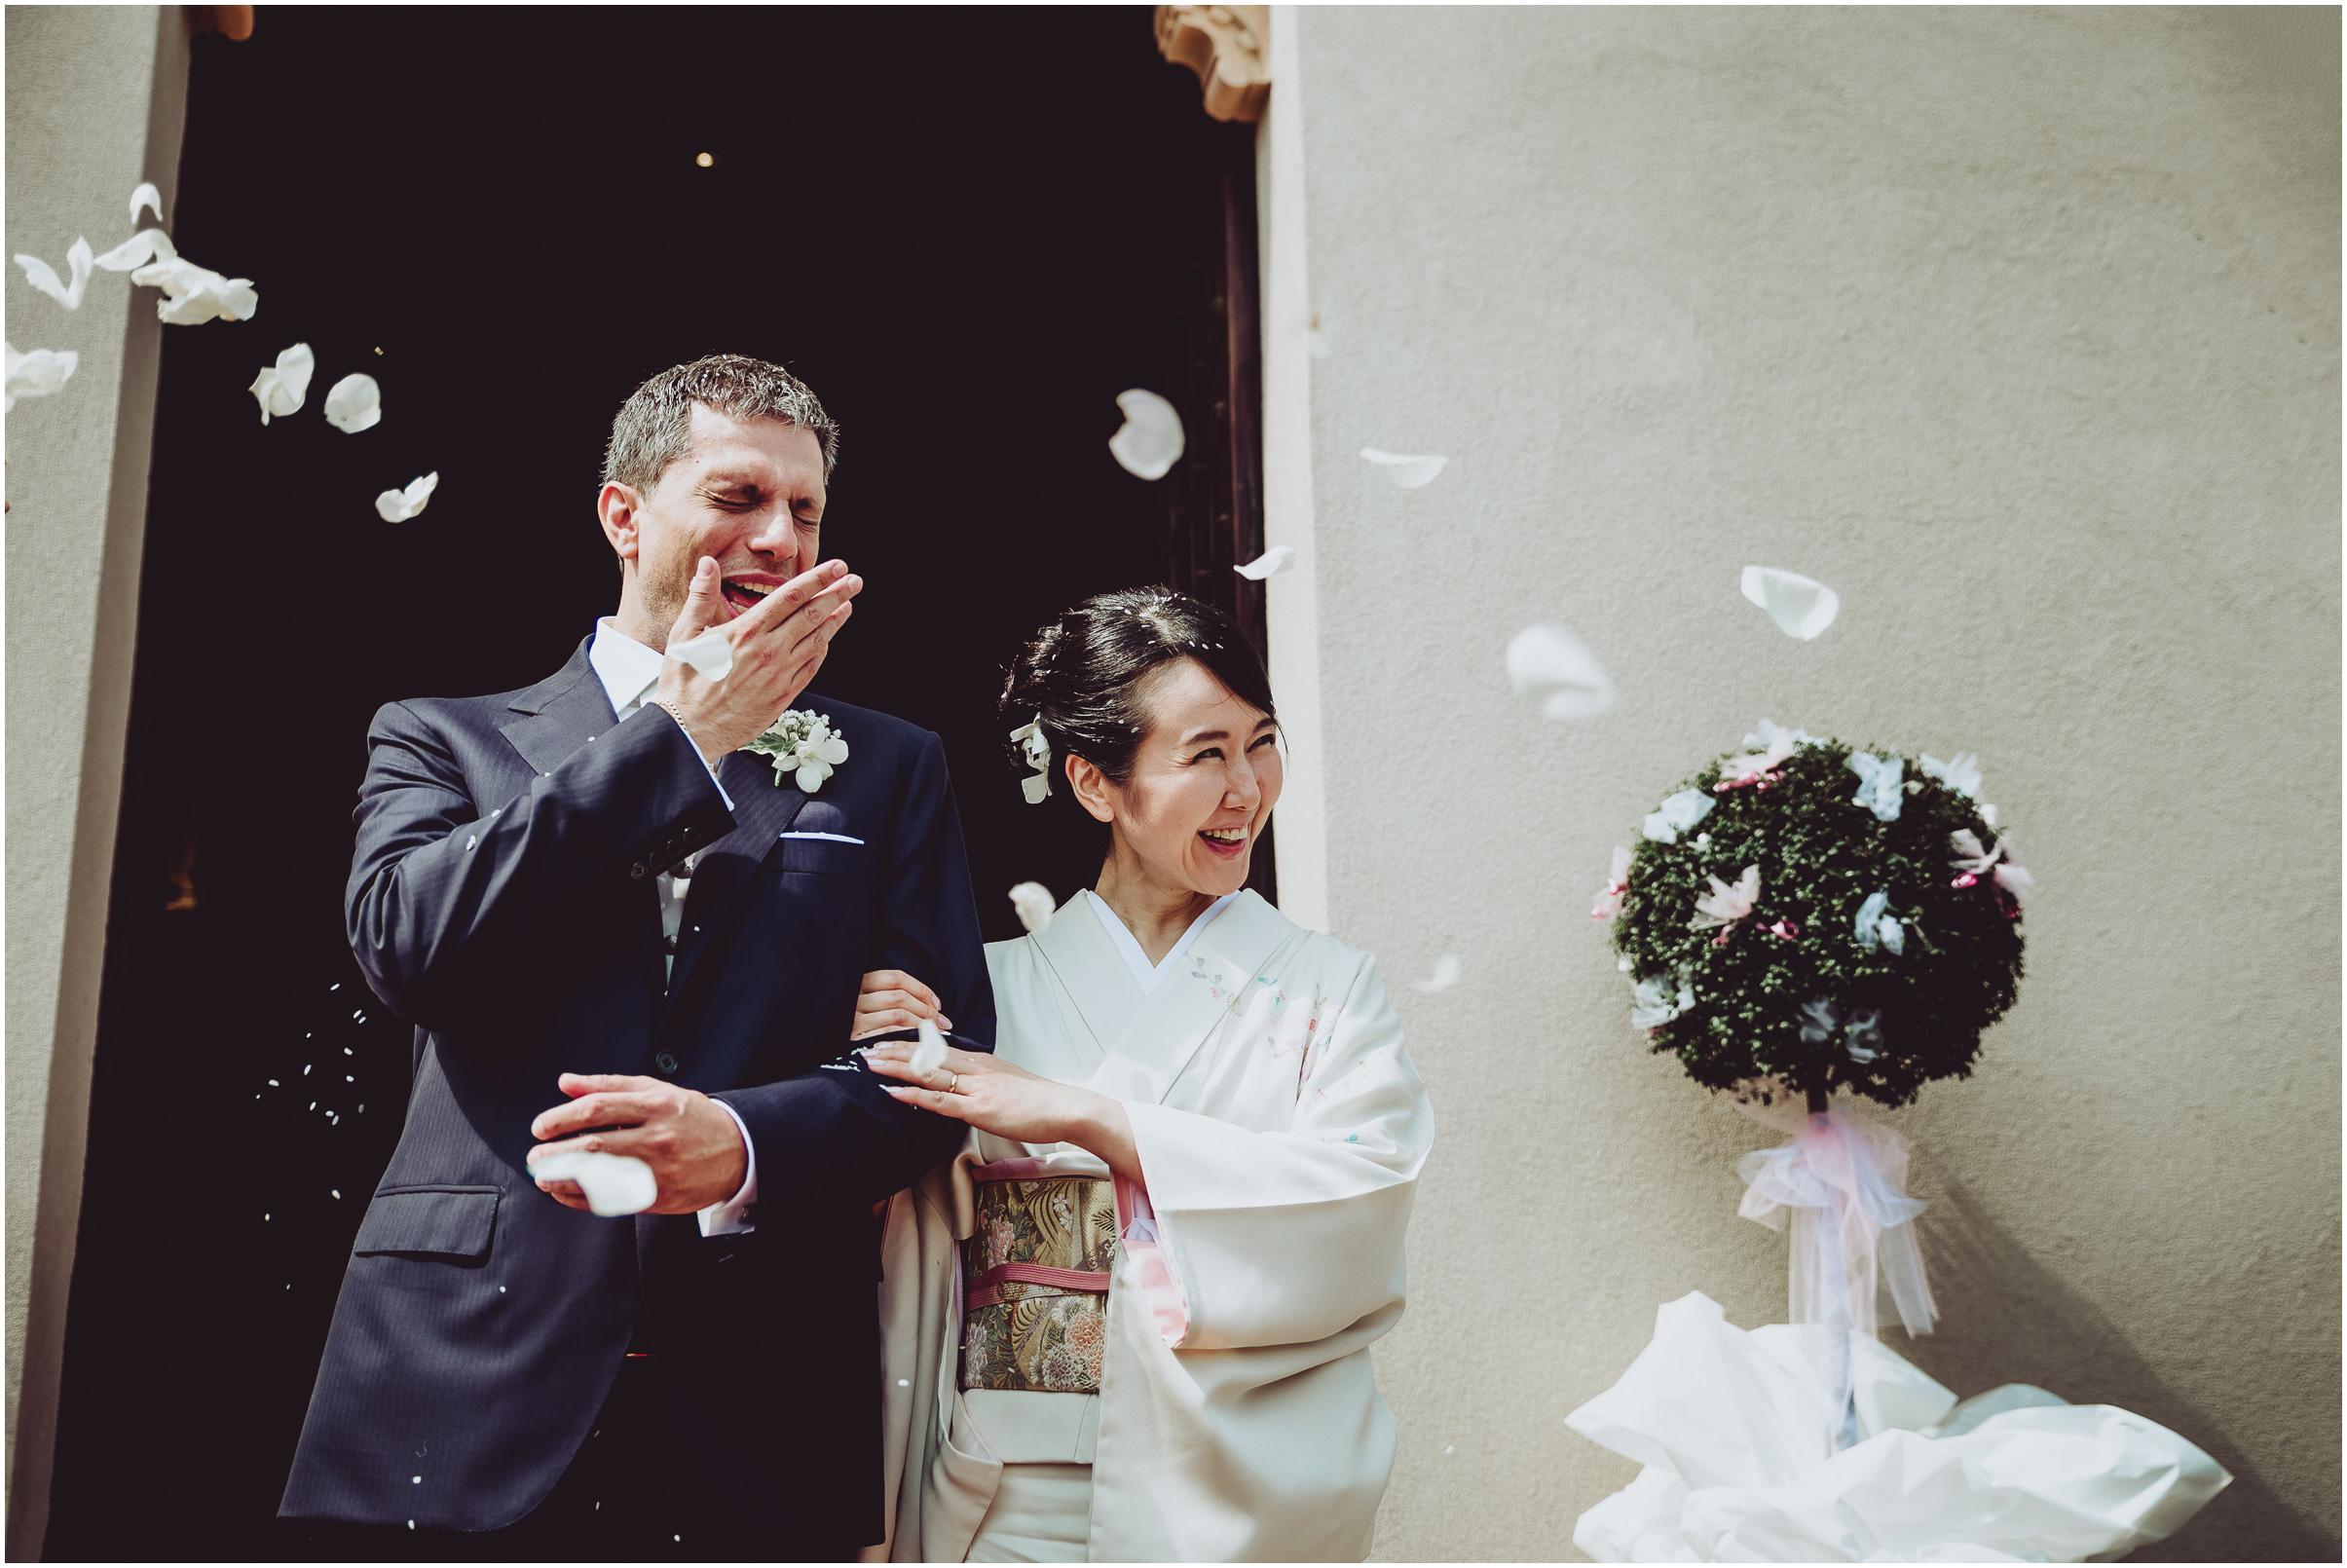 WEDDING-PHOTOGRAPHY-SARA-LORENZONI-FOTOGRAFIA-MATRIMONIO-ORVIETO-JUKA-ANTONELLO26